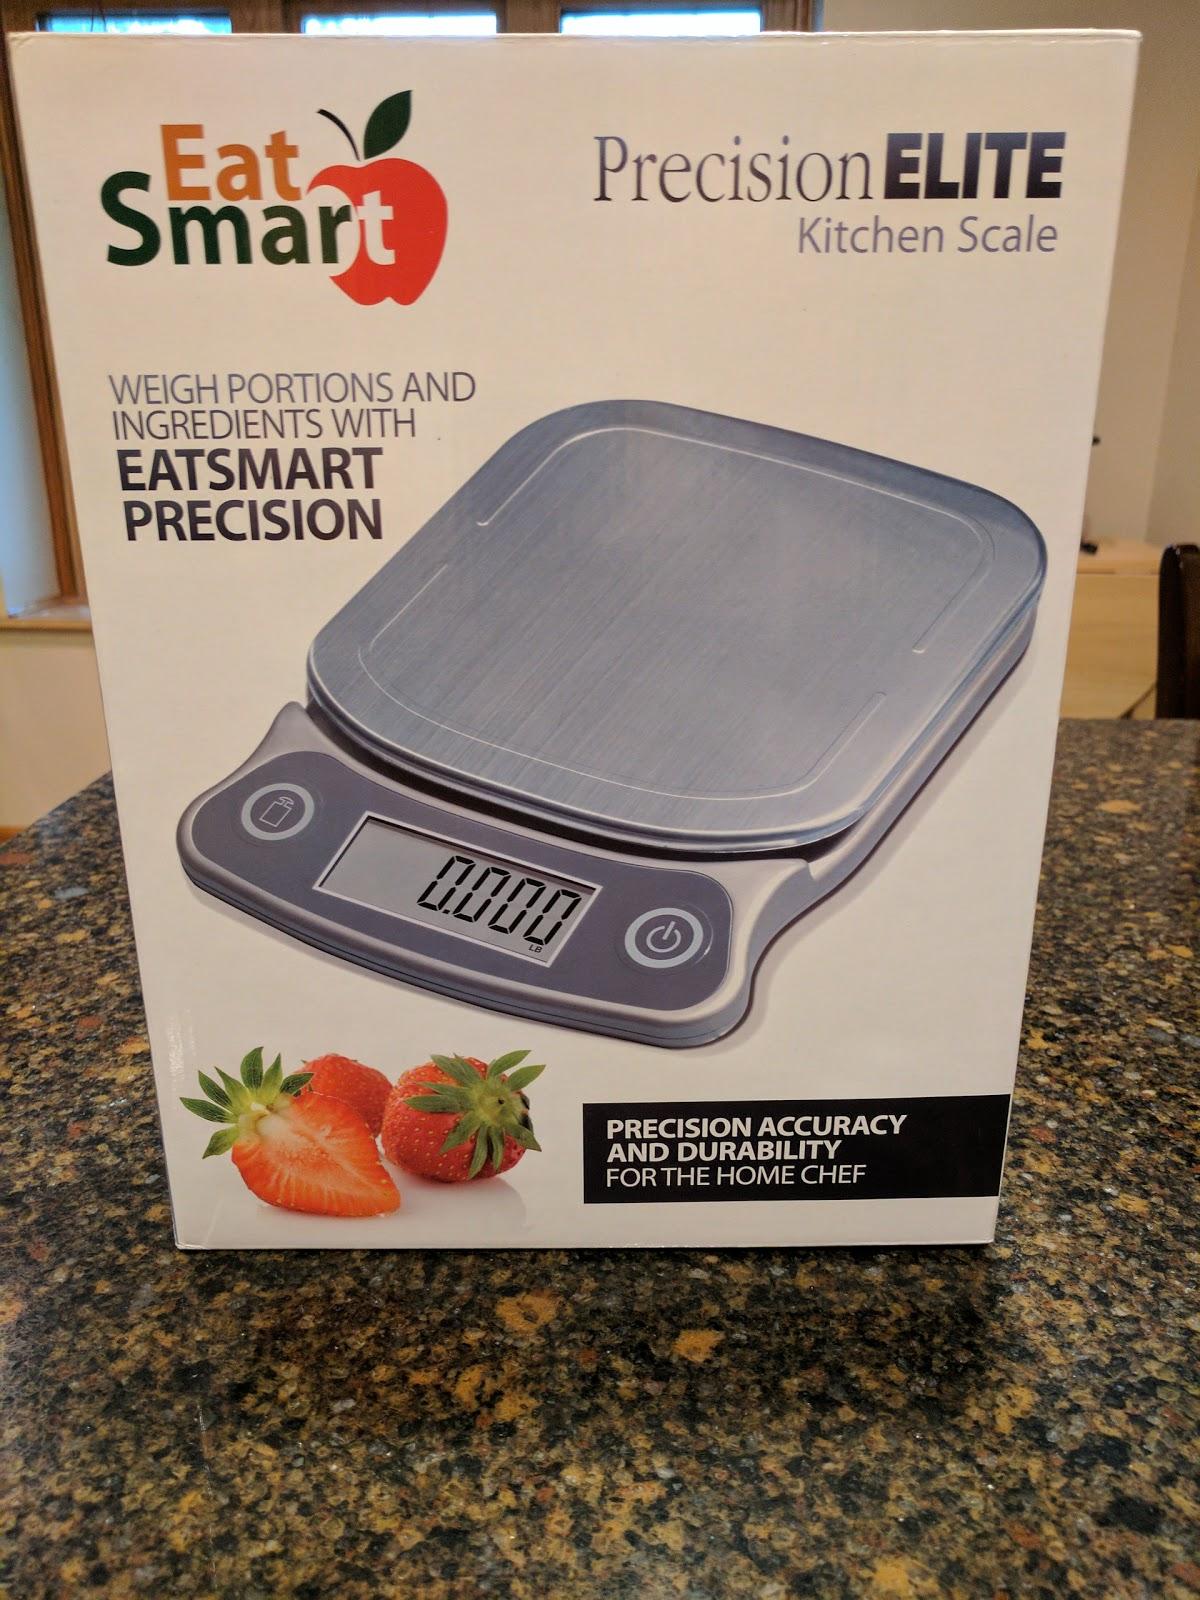 Eatsmart precision elite digital kitchen scale review for Perfect kitchen pro smart scale